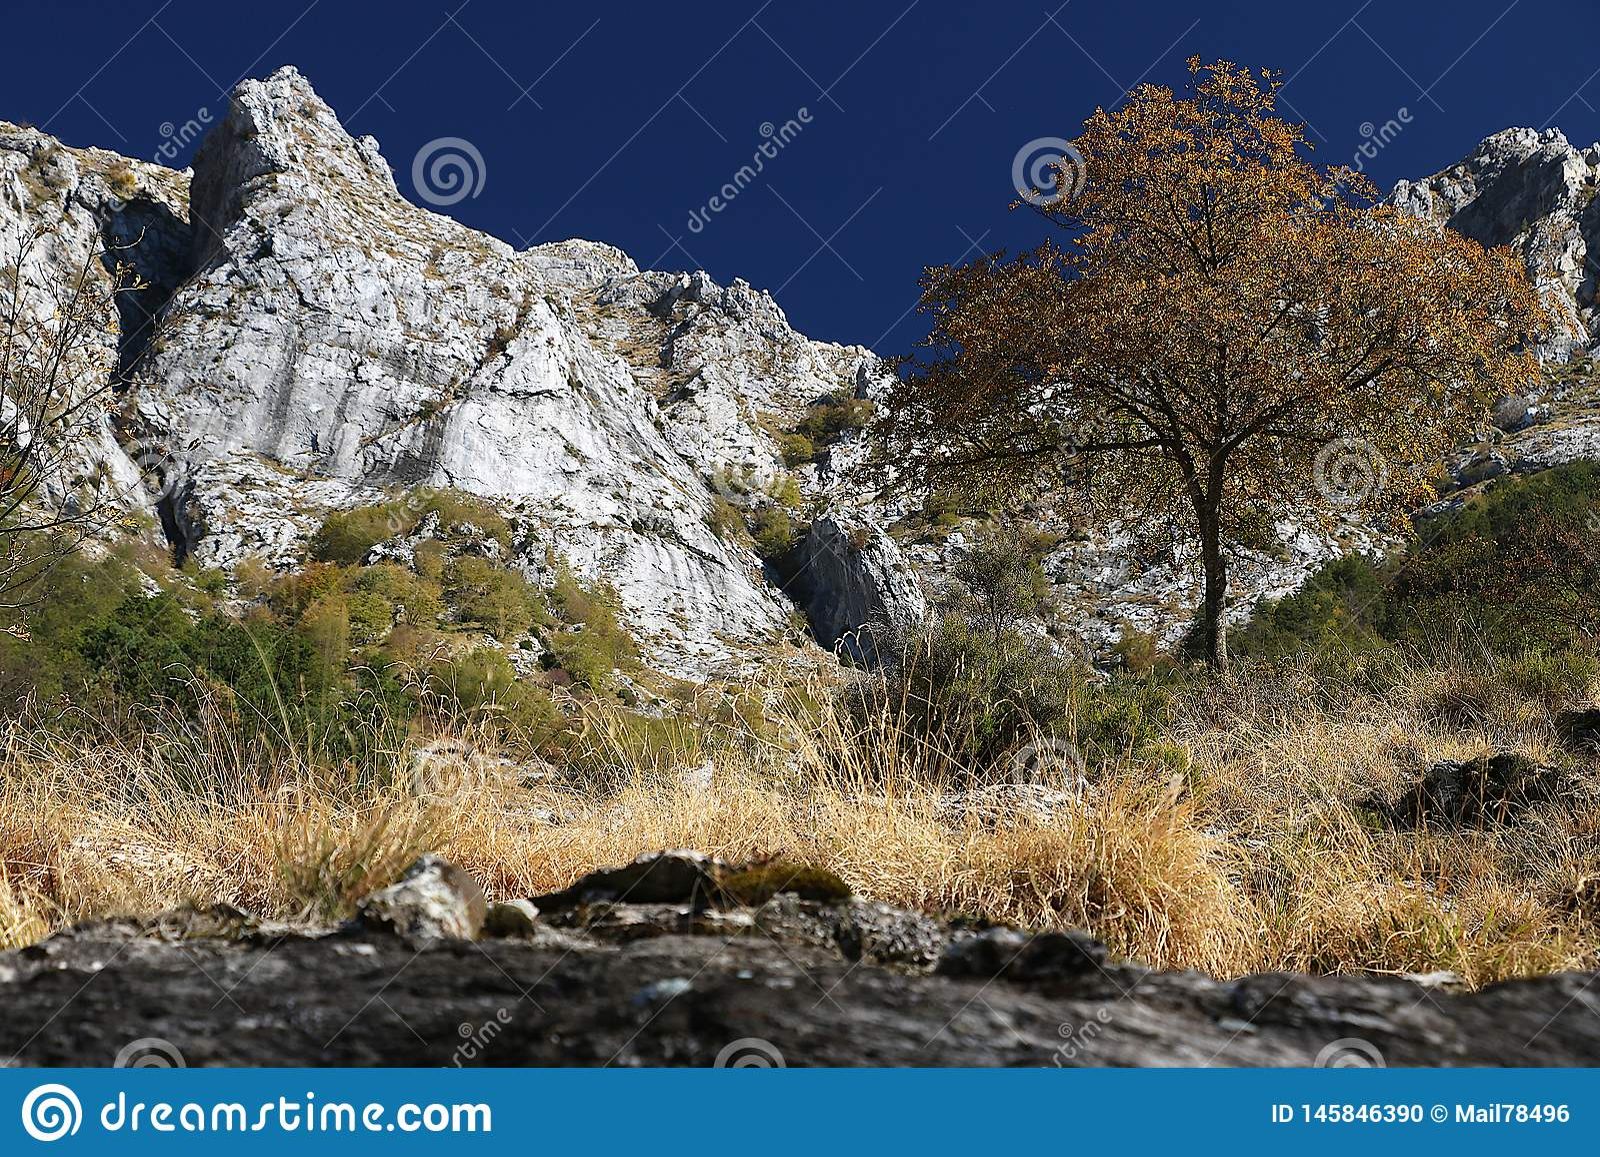 Alpi Apuane, Massa Carrara, Tuscany, Italy. Landscape with mount